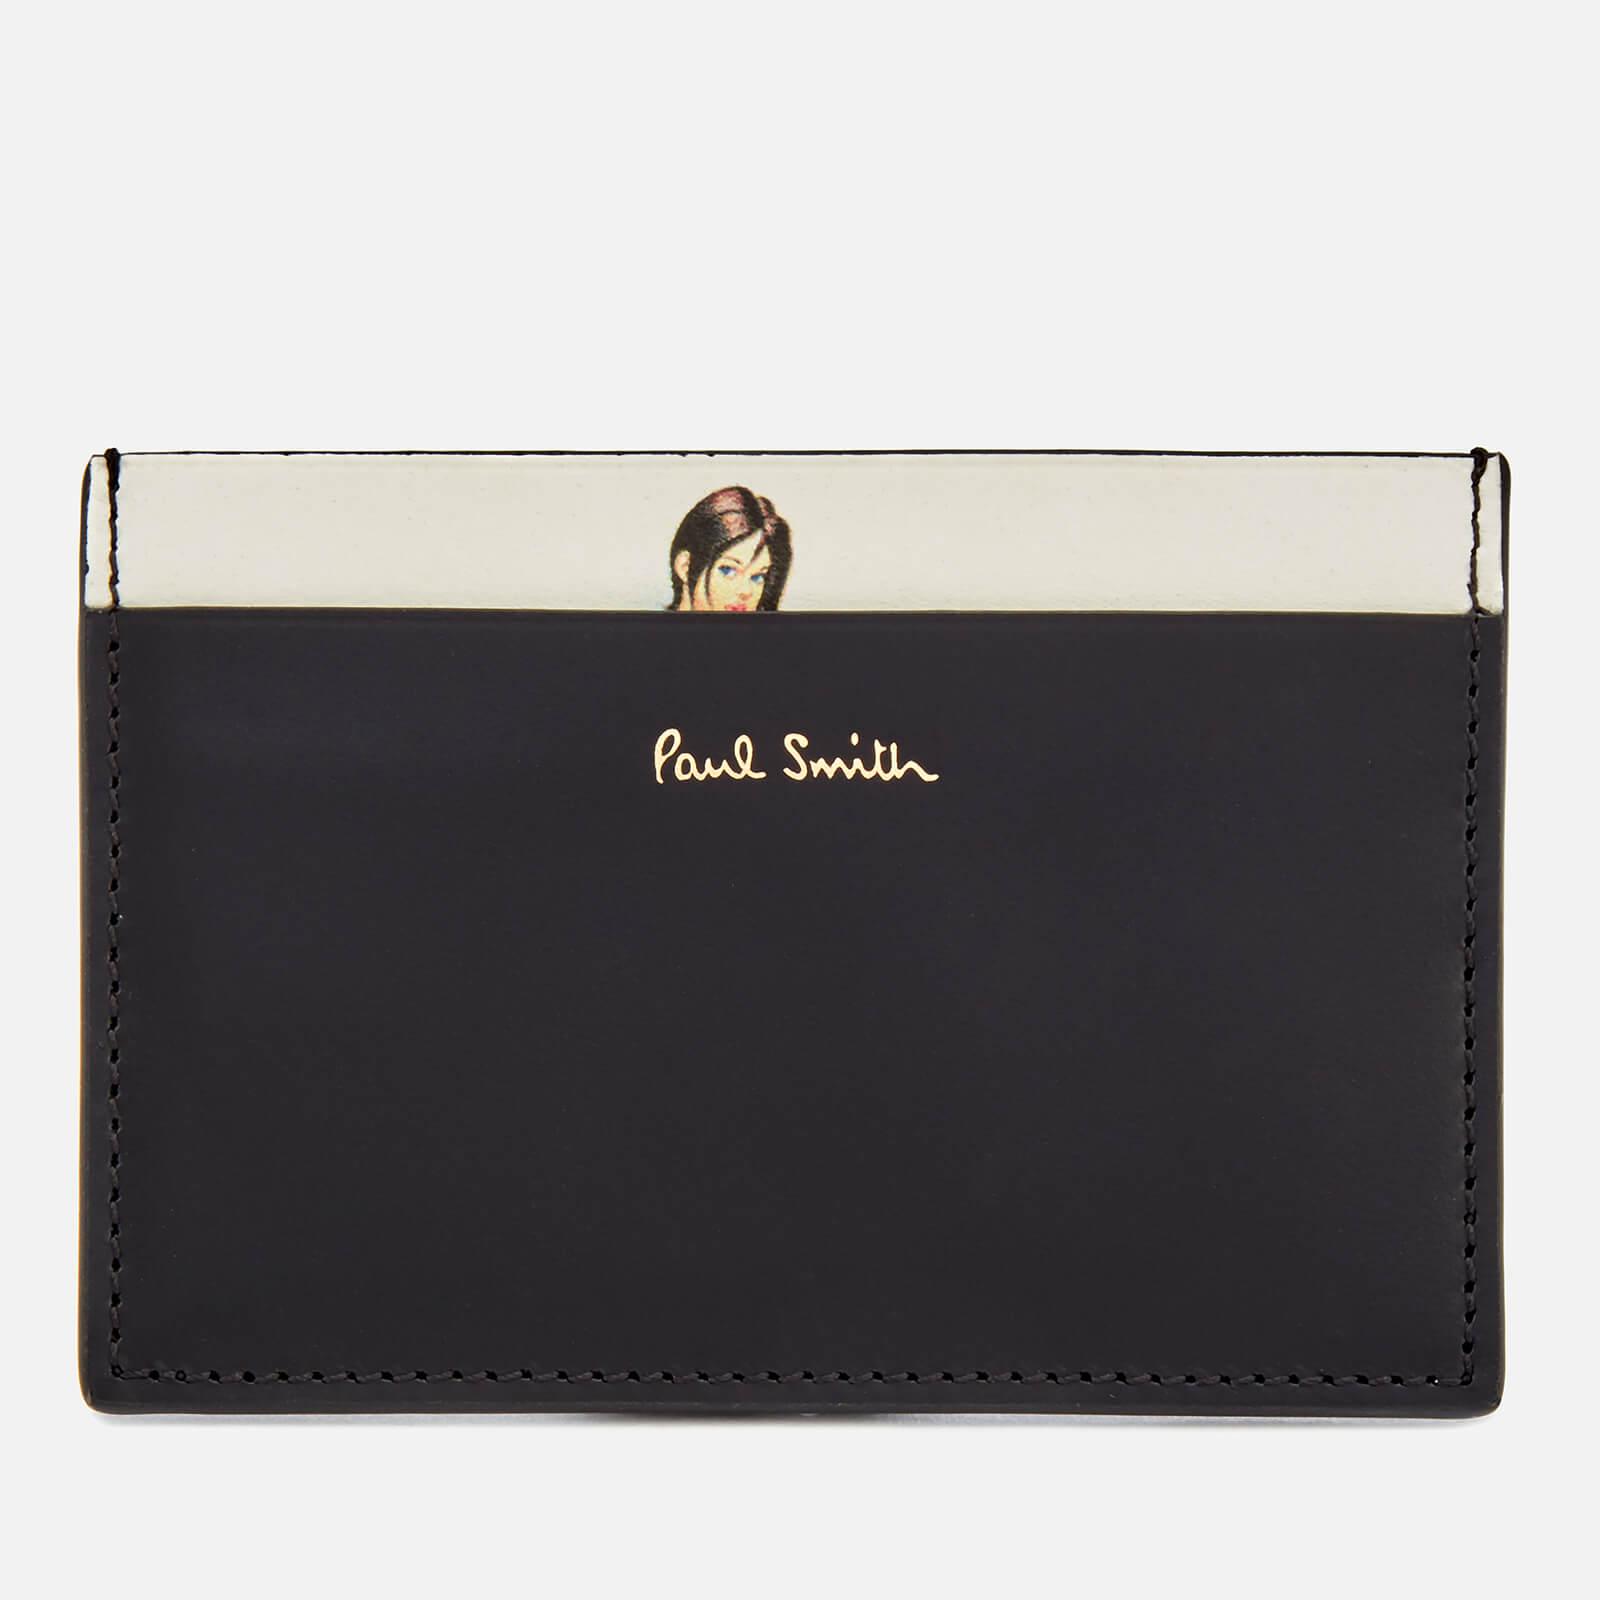 Paul Smith Men's Naked Lady Credit Card Case - Black